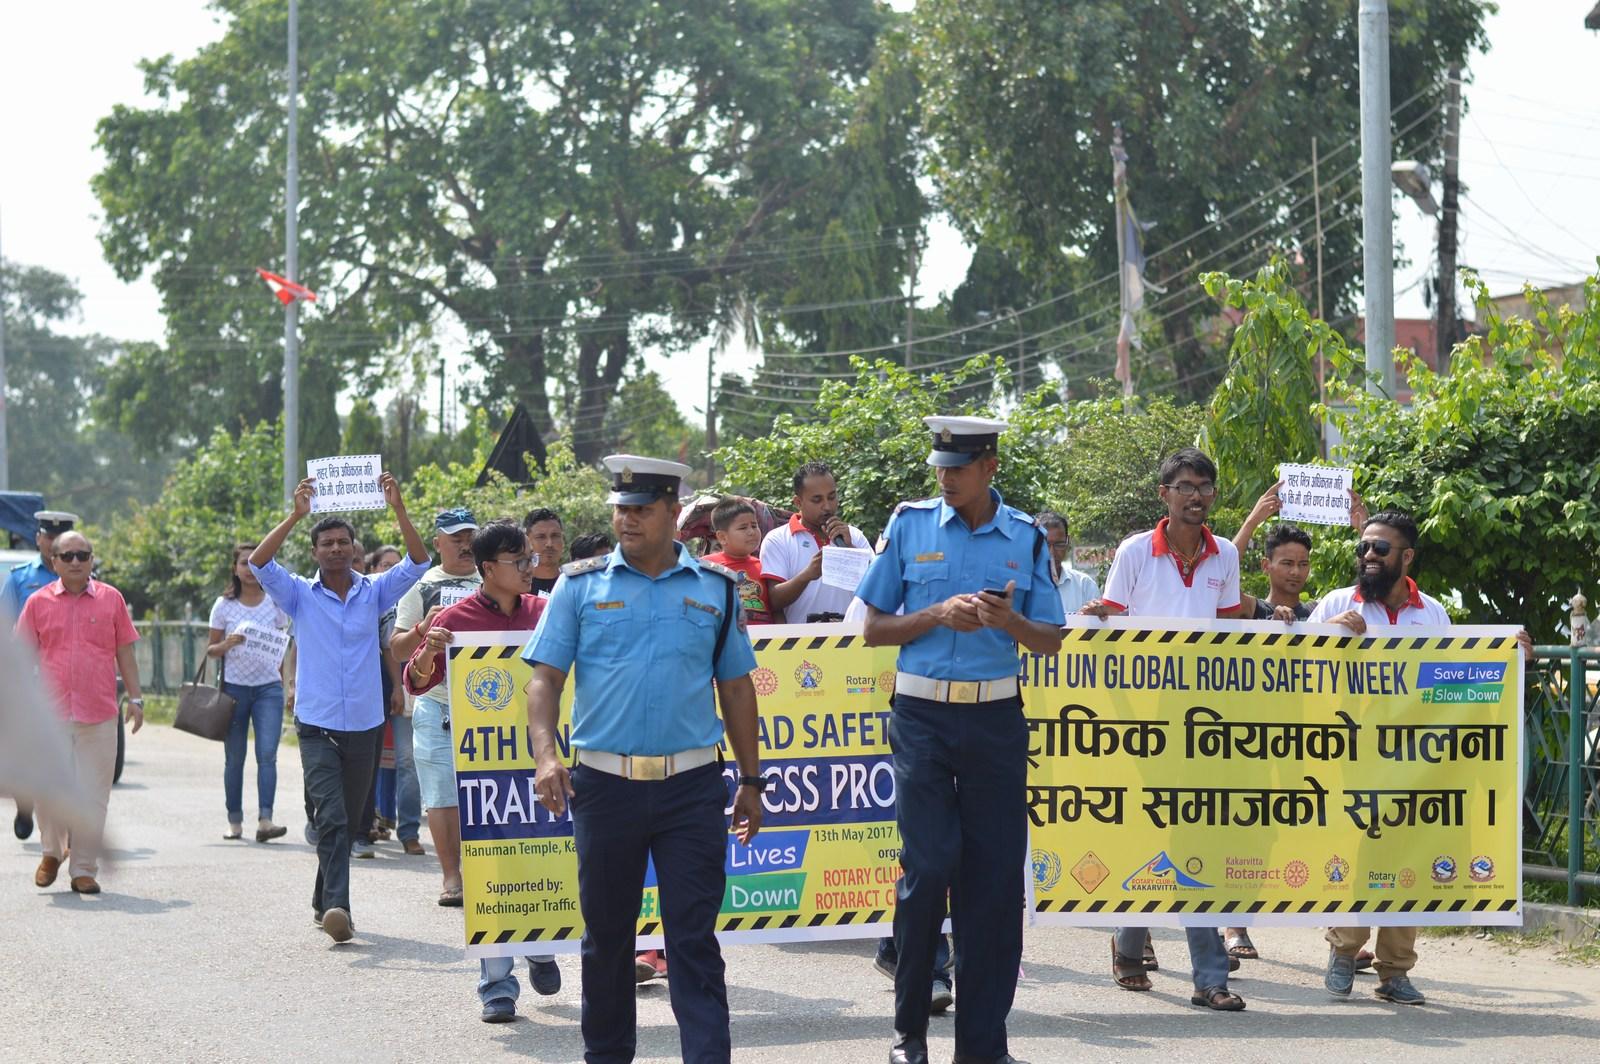 4th-UN-Global-Road-Safety-Week-2017-Traffic-Awareness-Program-Rotary-club-of-Kakarvitta-41